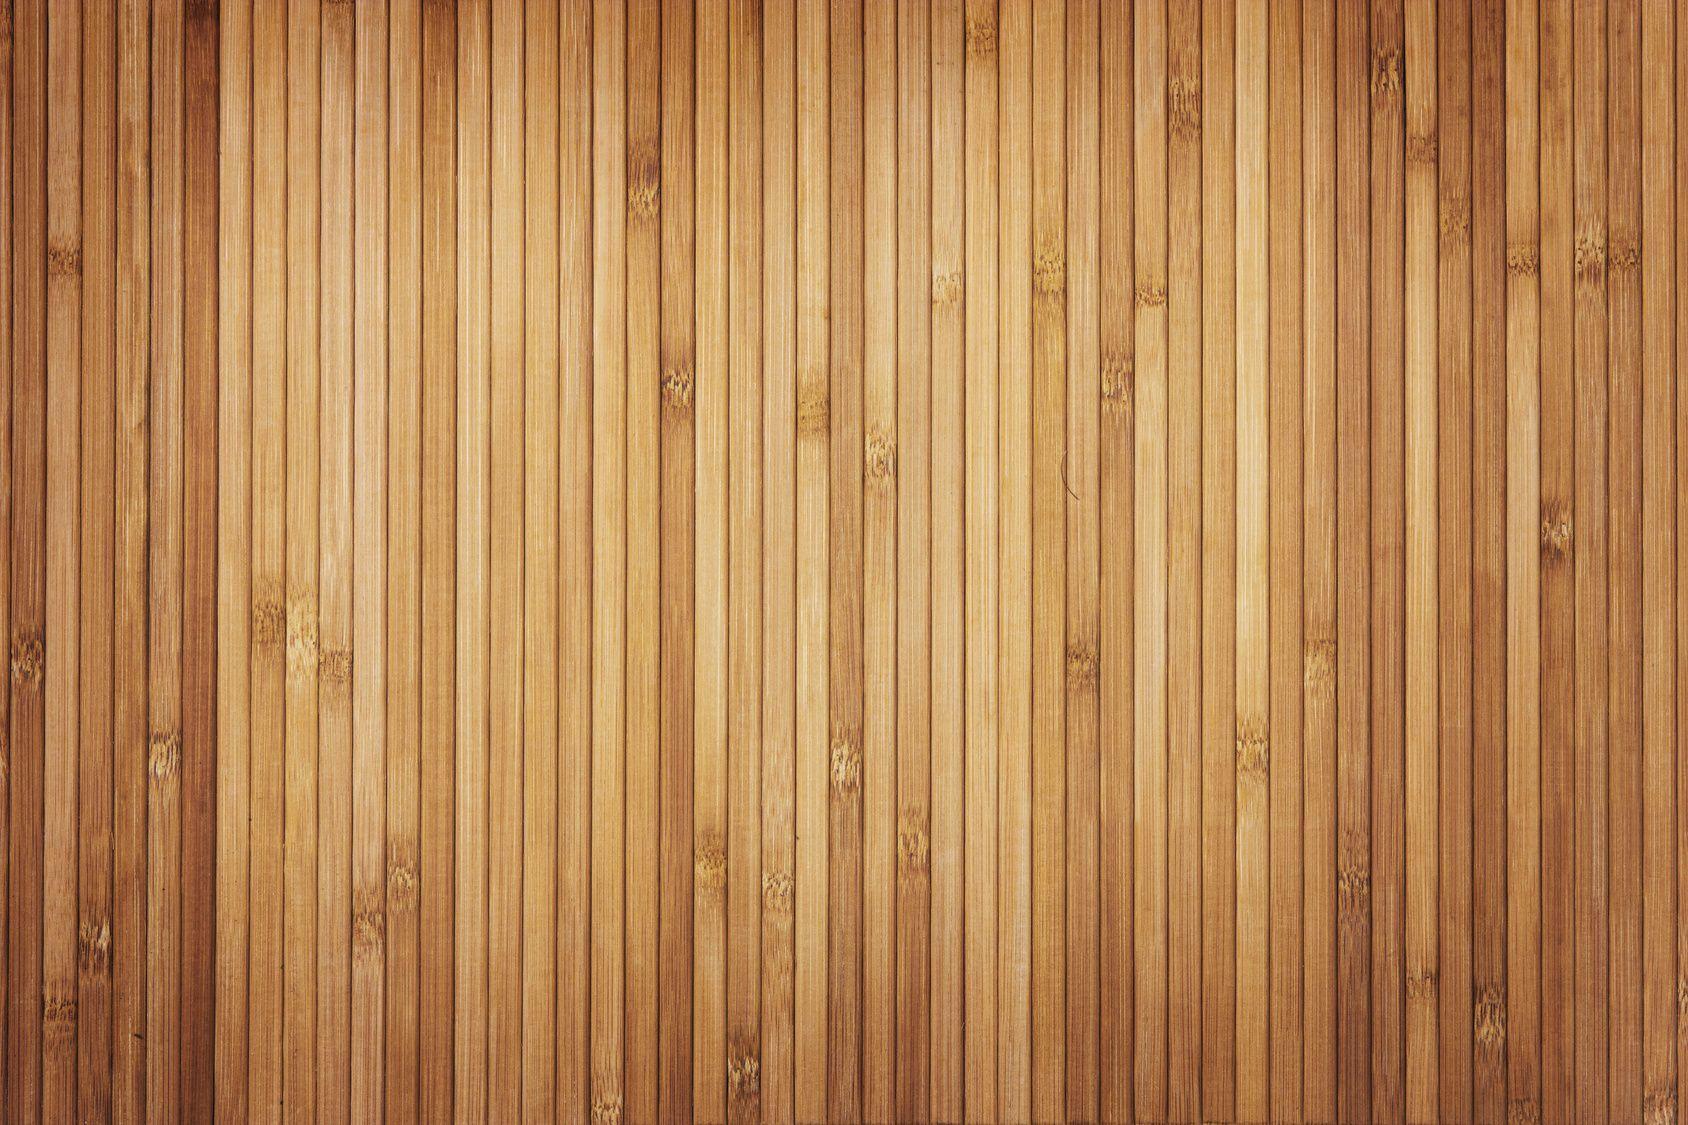 Wood Texture By Yasse Inne On Deviantart Free Wood Texture Wood Texture Wood Table Texture